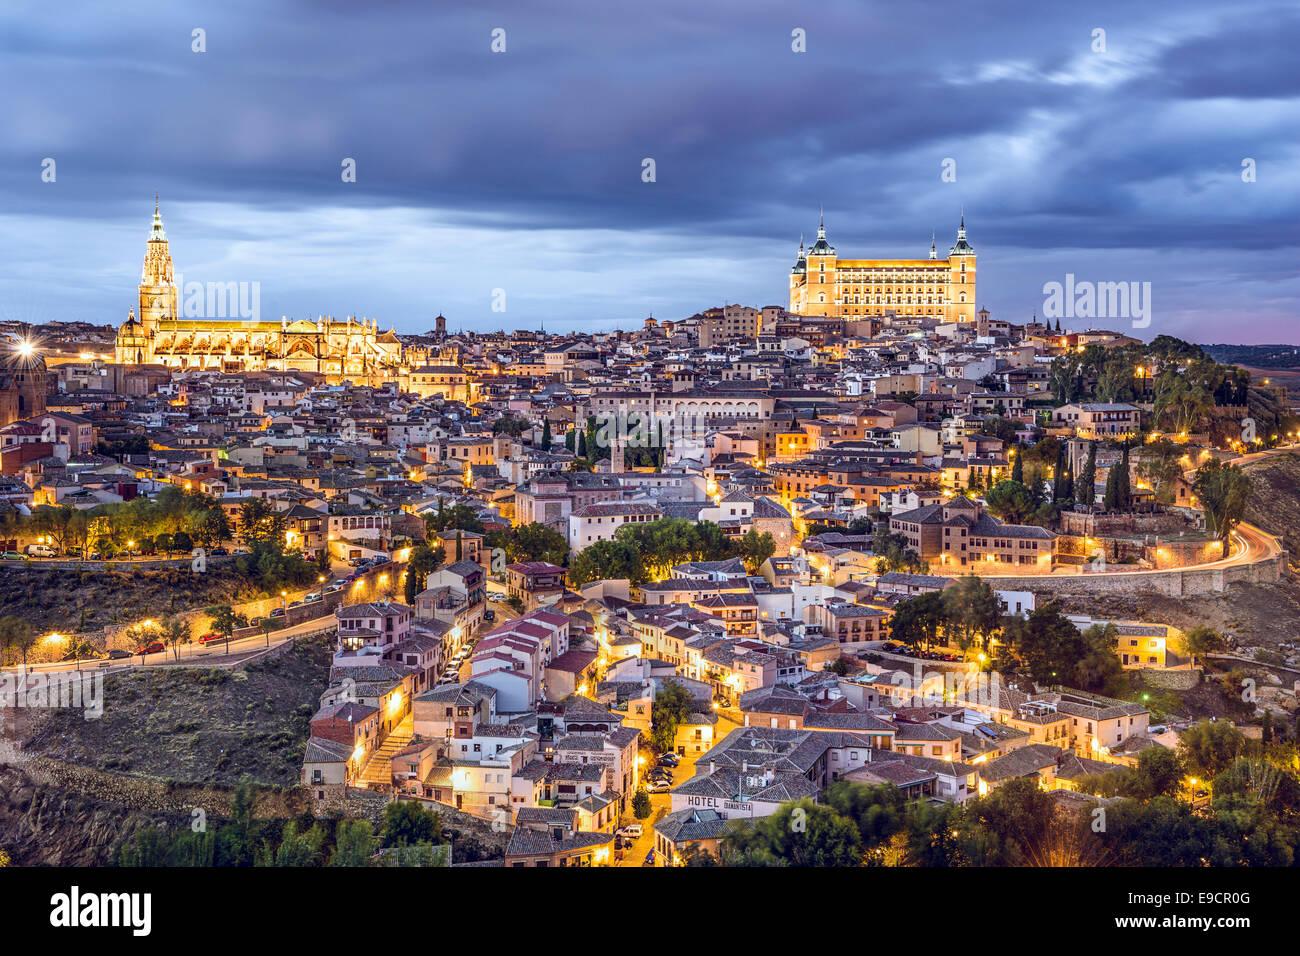 Toledo, Spain town skyline on the Tagus River. Stock Photo